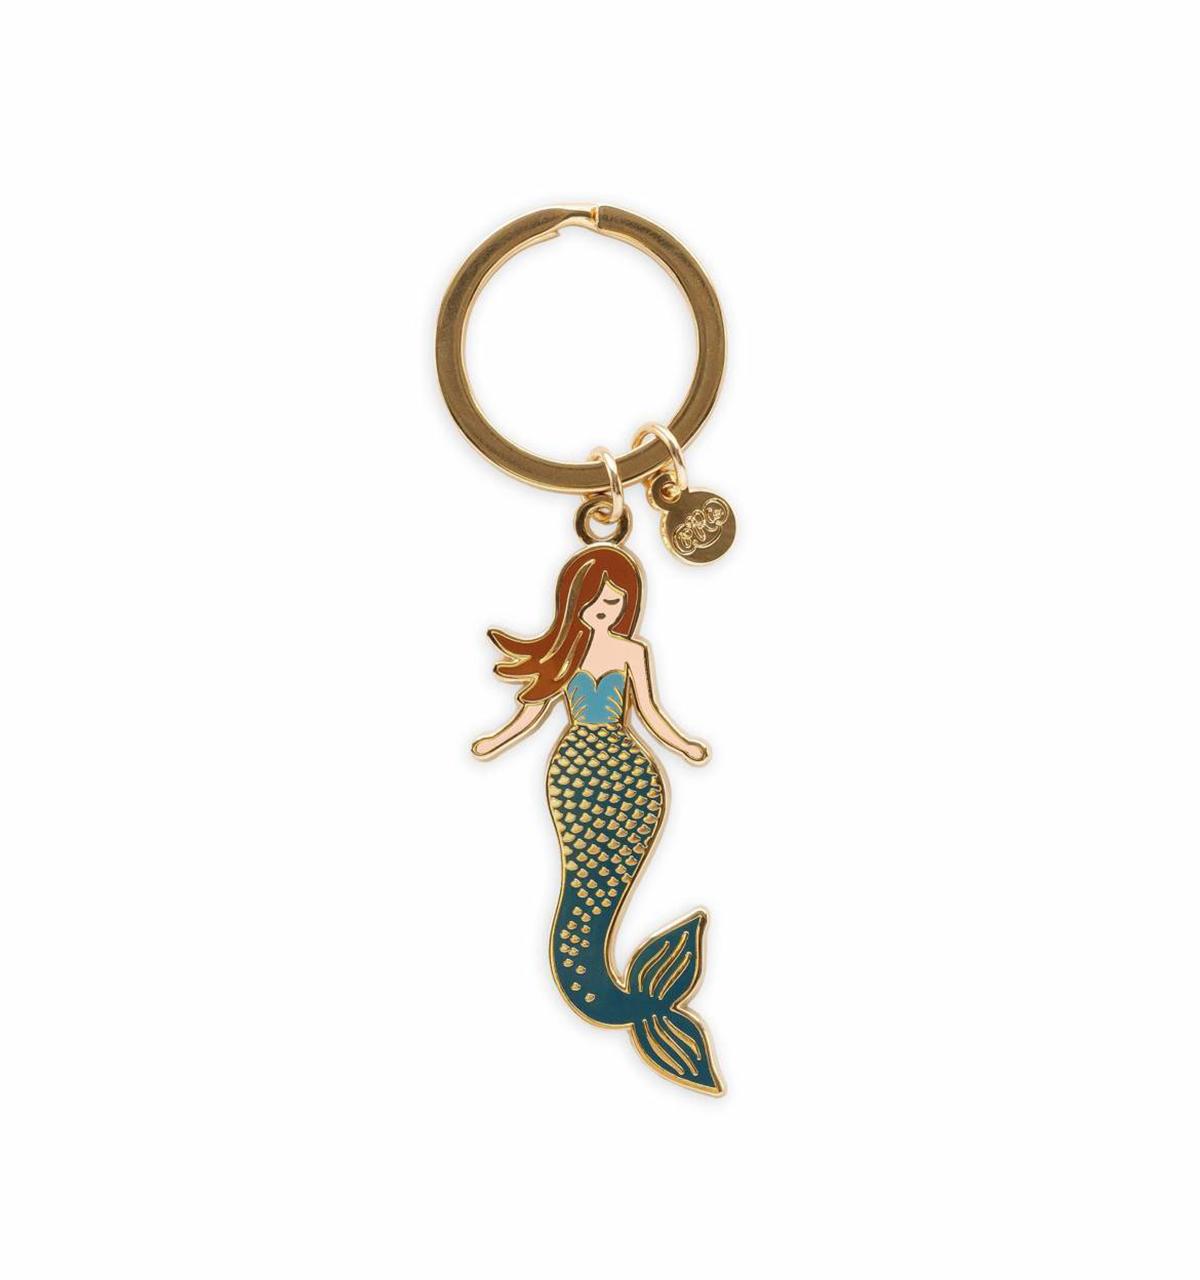 Porte-clés mermaid